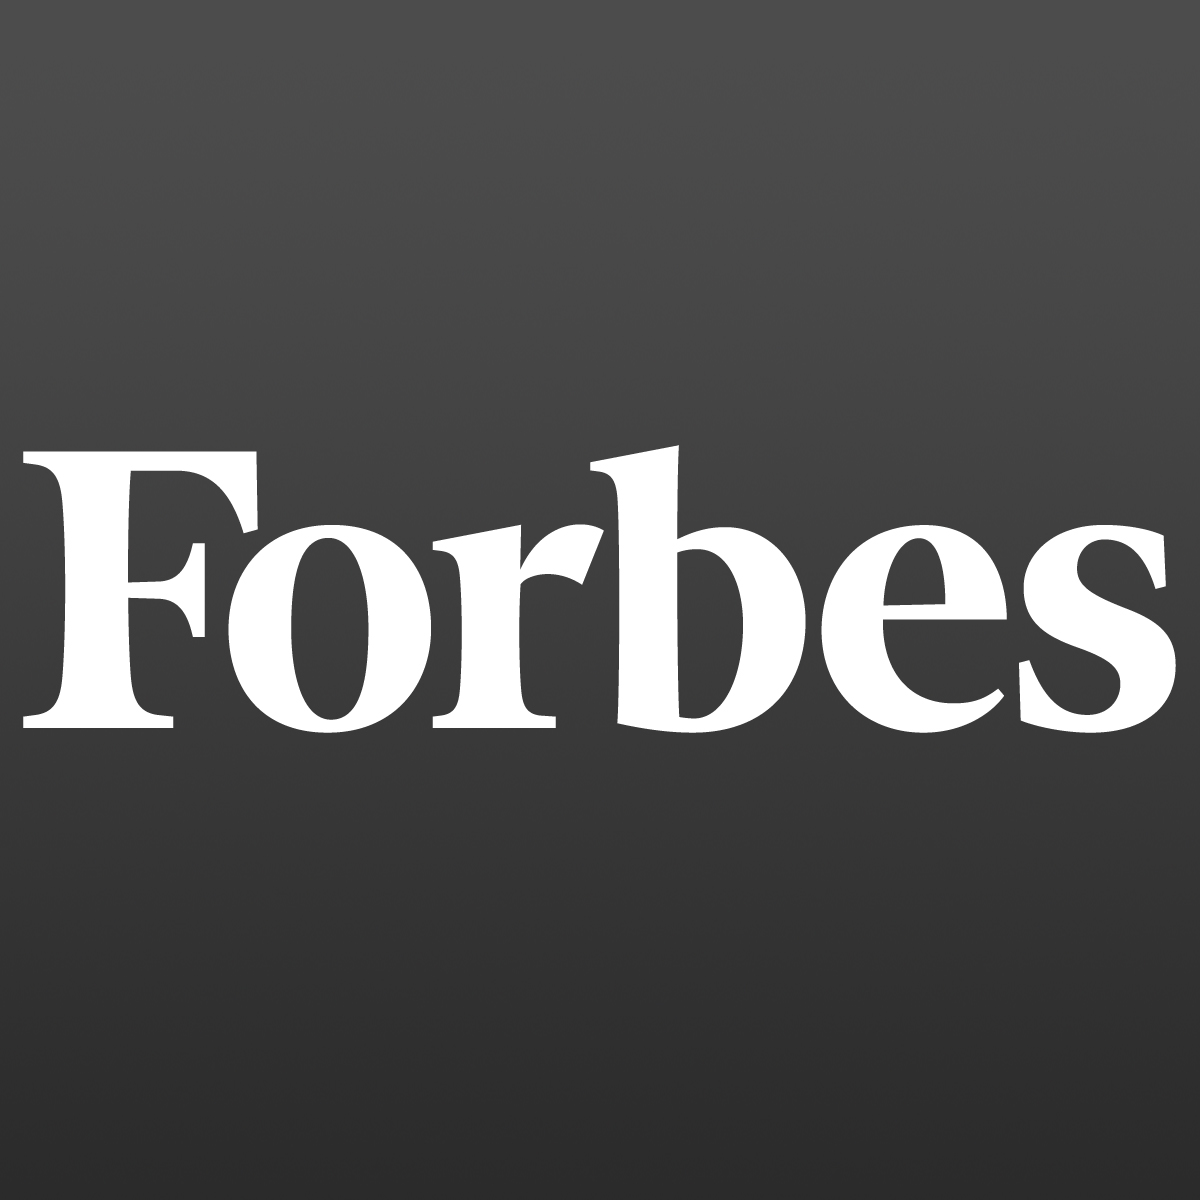 forbes_1200x1200 logo.jpg